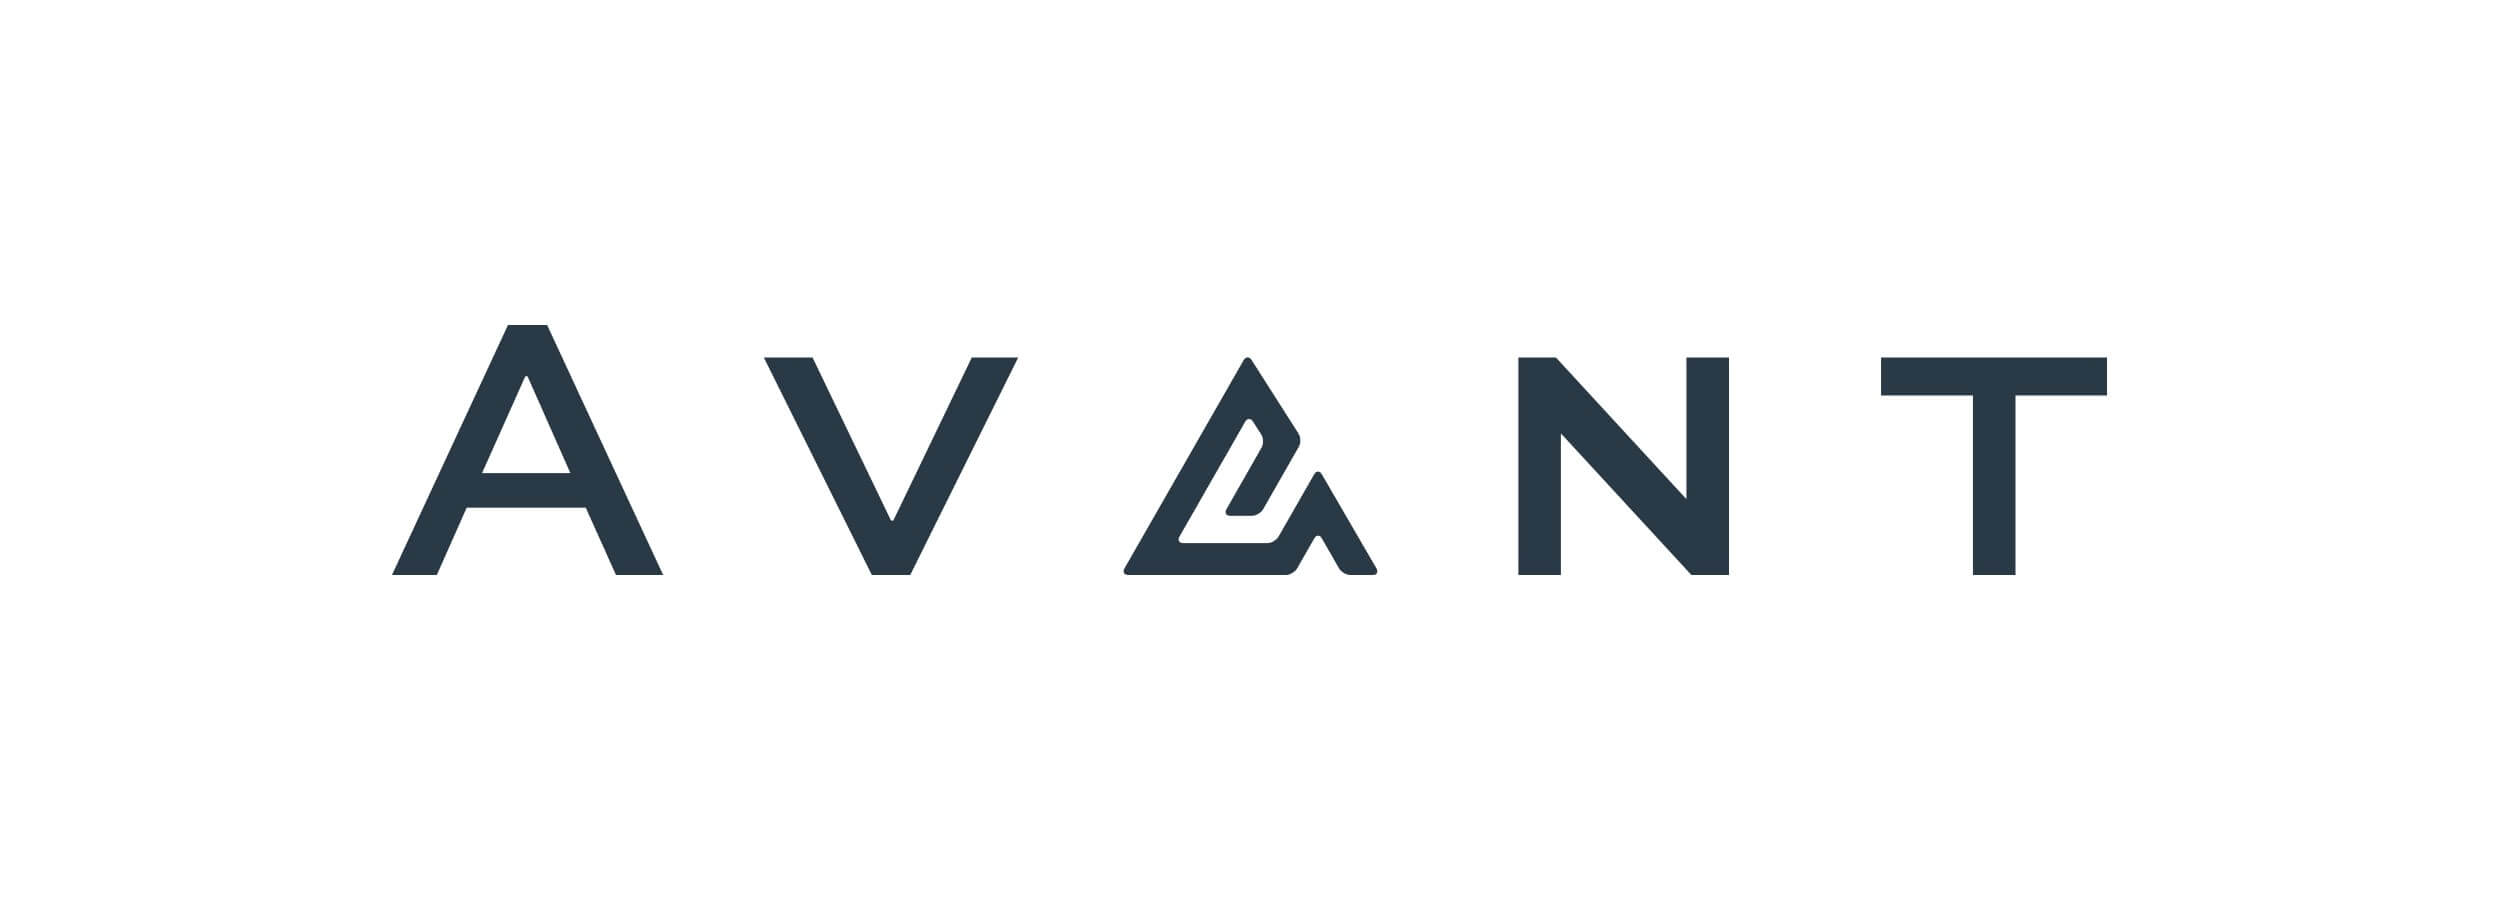 Avant review logo